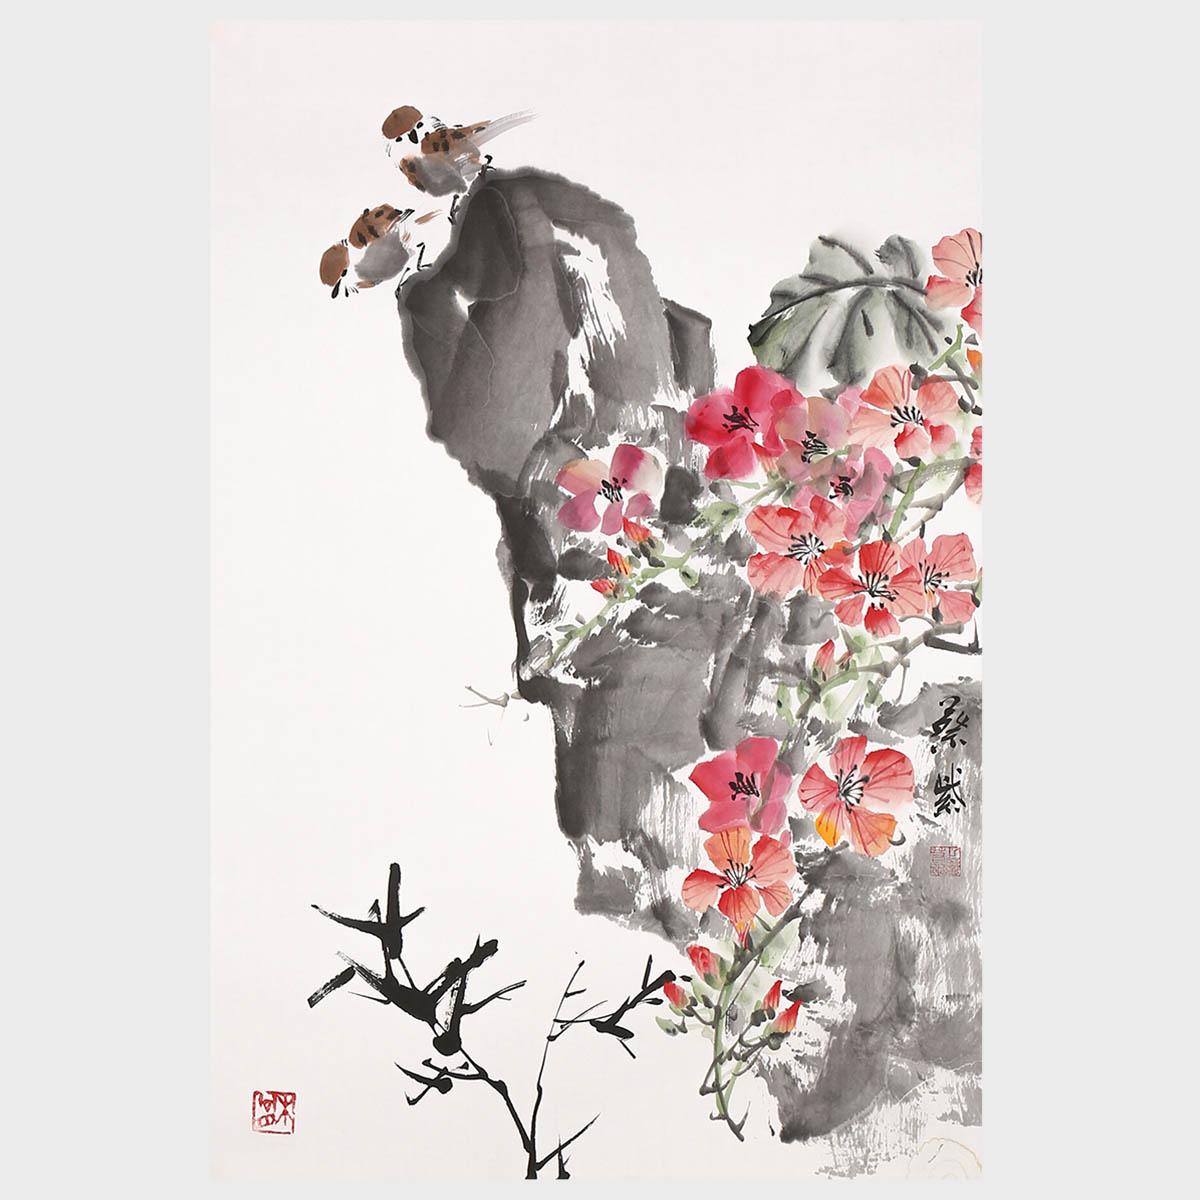 Sommerfeld Blumen Malerei Kostenloses Stock Bild Public Domain